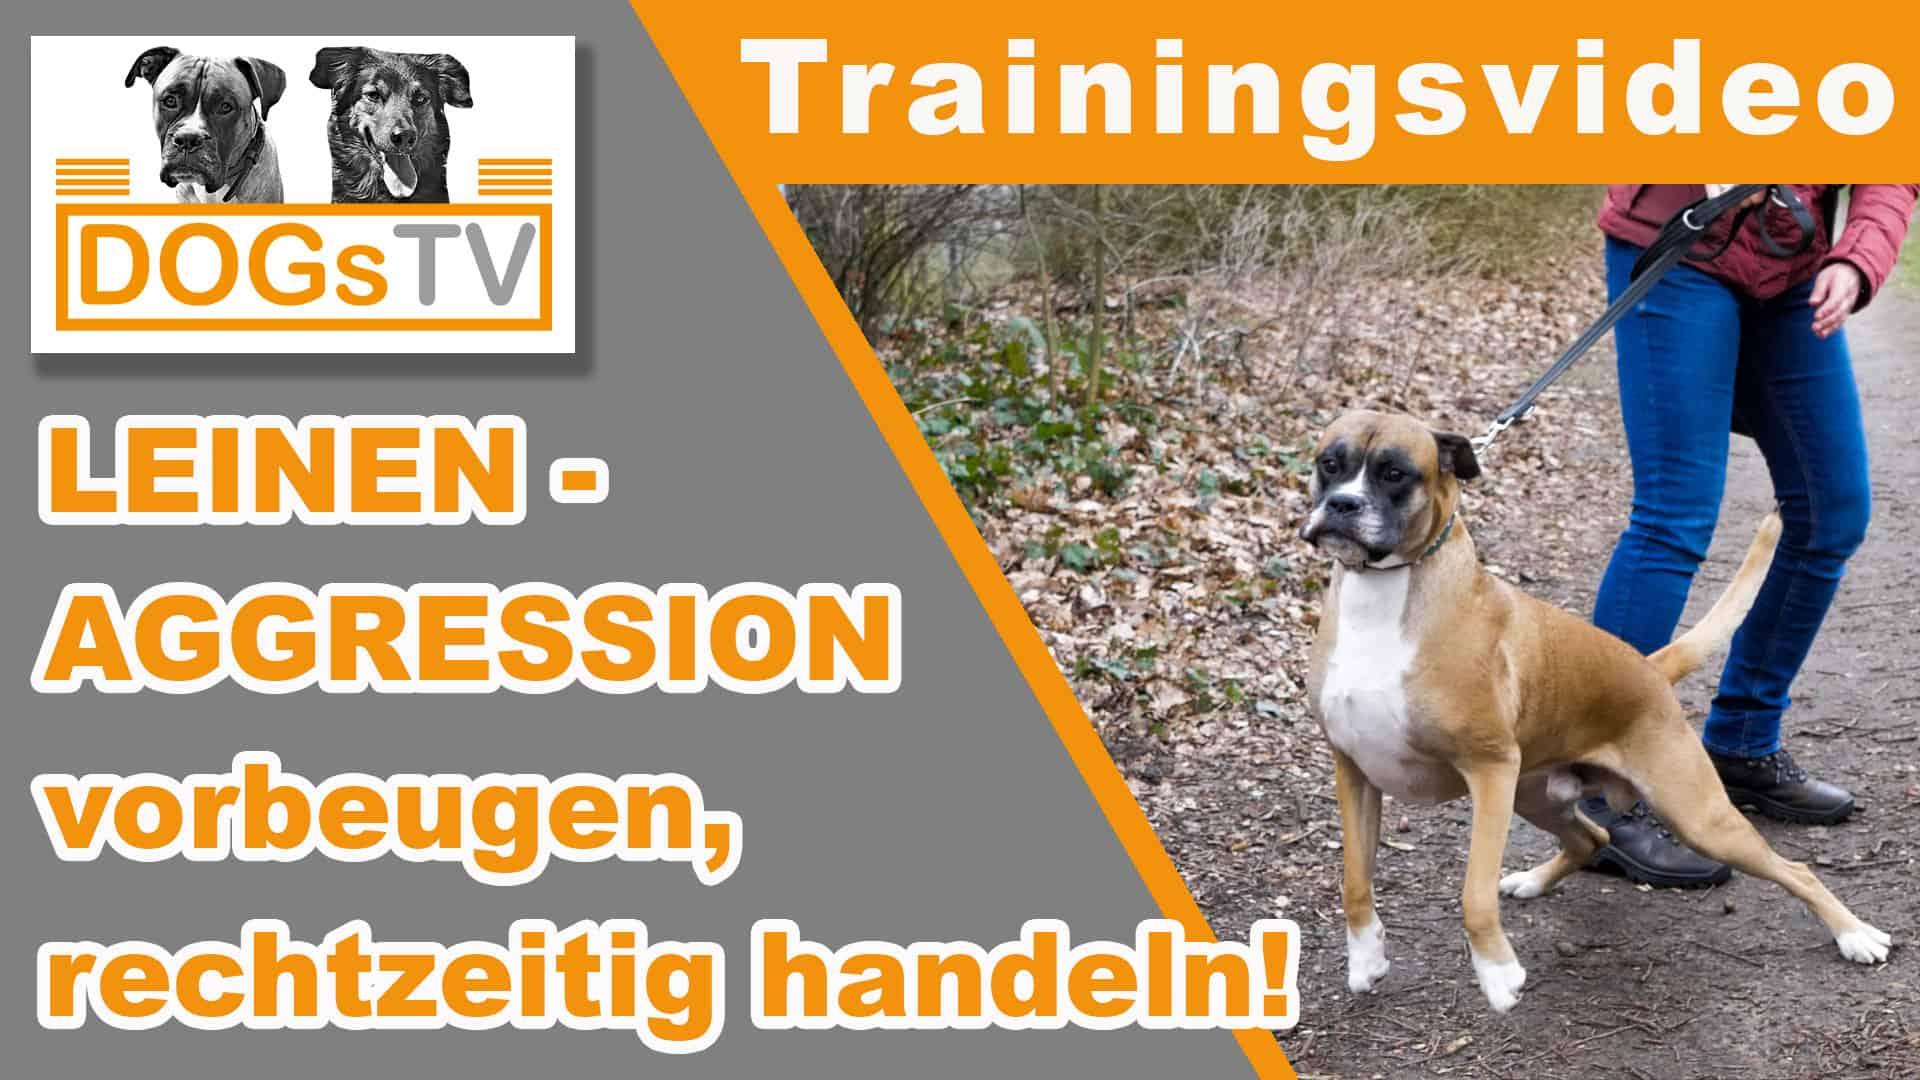 leinenaggression hund dogstv